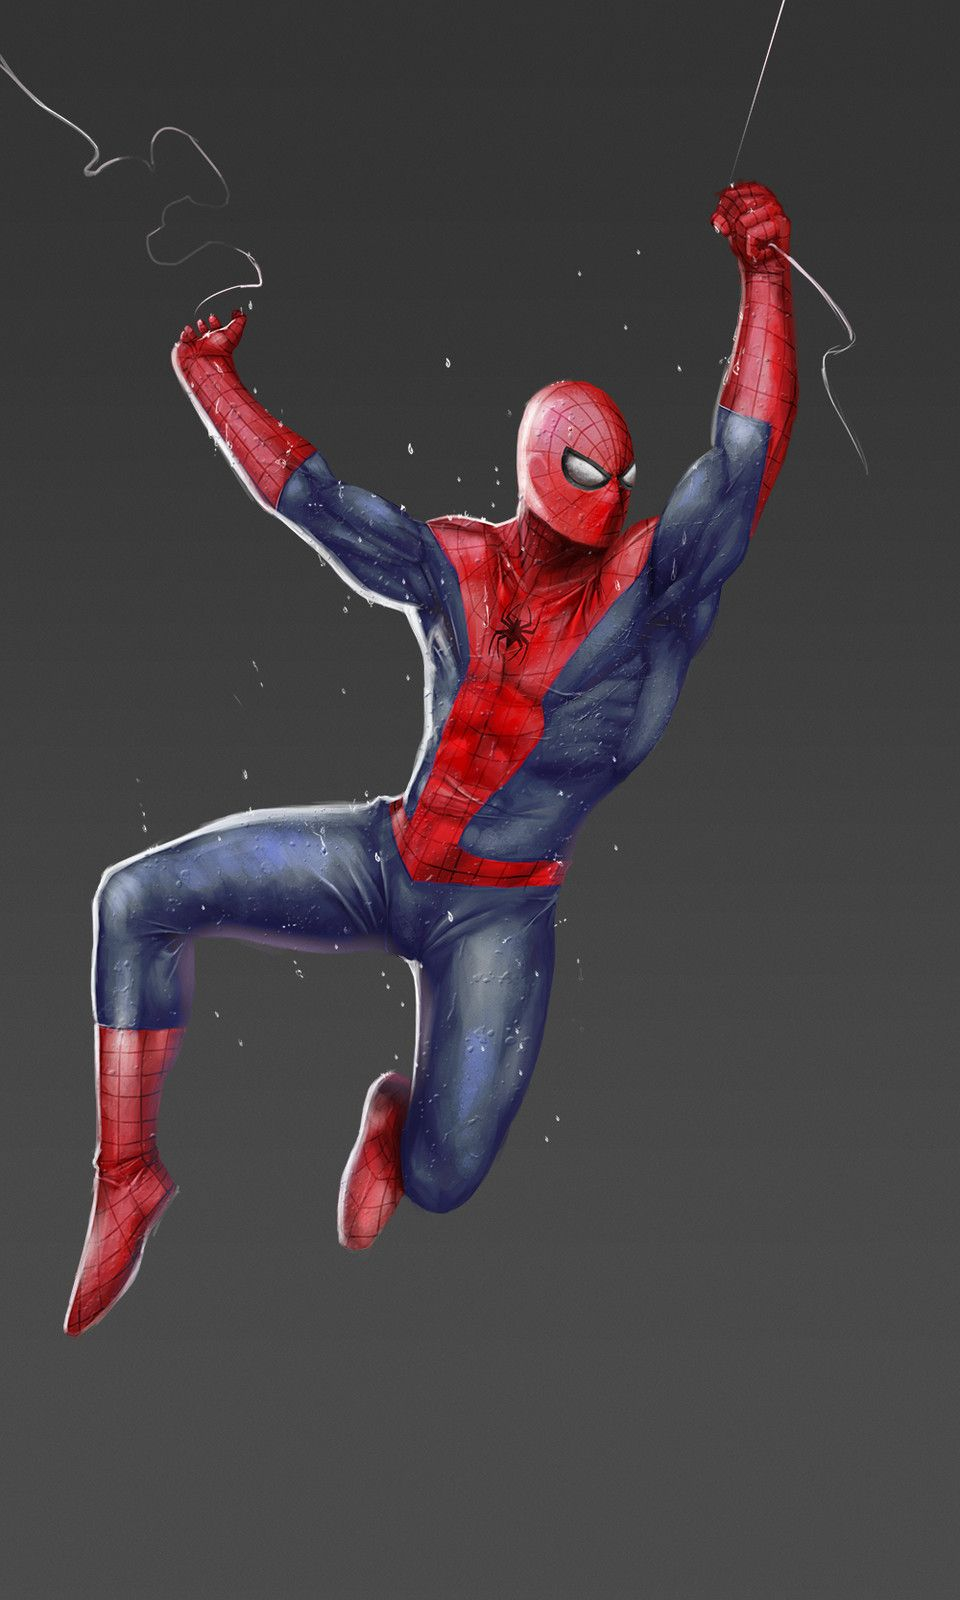 #Spiderman #Fan #Art. (Spider-Man) By: Egor Samsonov. (THE * 5 * STÅR * ÅWARD * OF: * AW YEAH, IT'S MAJOR ÅWESOMENESS!!!™)[THANK Ü 4 PINNING!!!<·><]<©>ÅÅÅ+(OB4E)